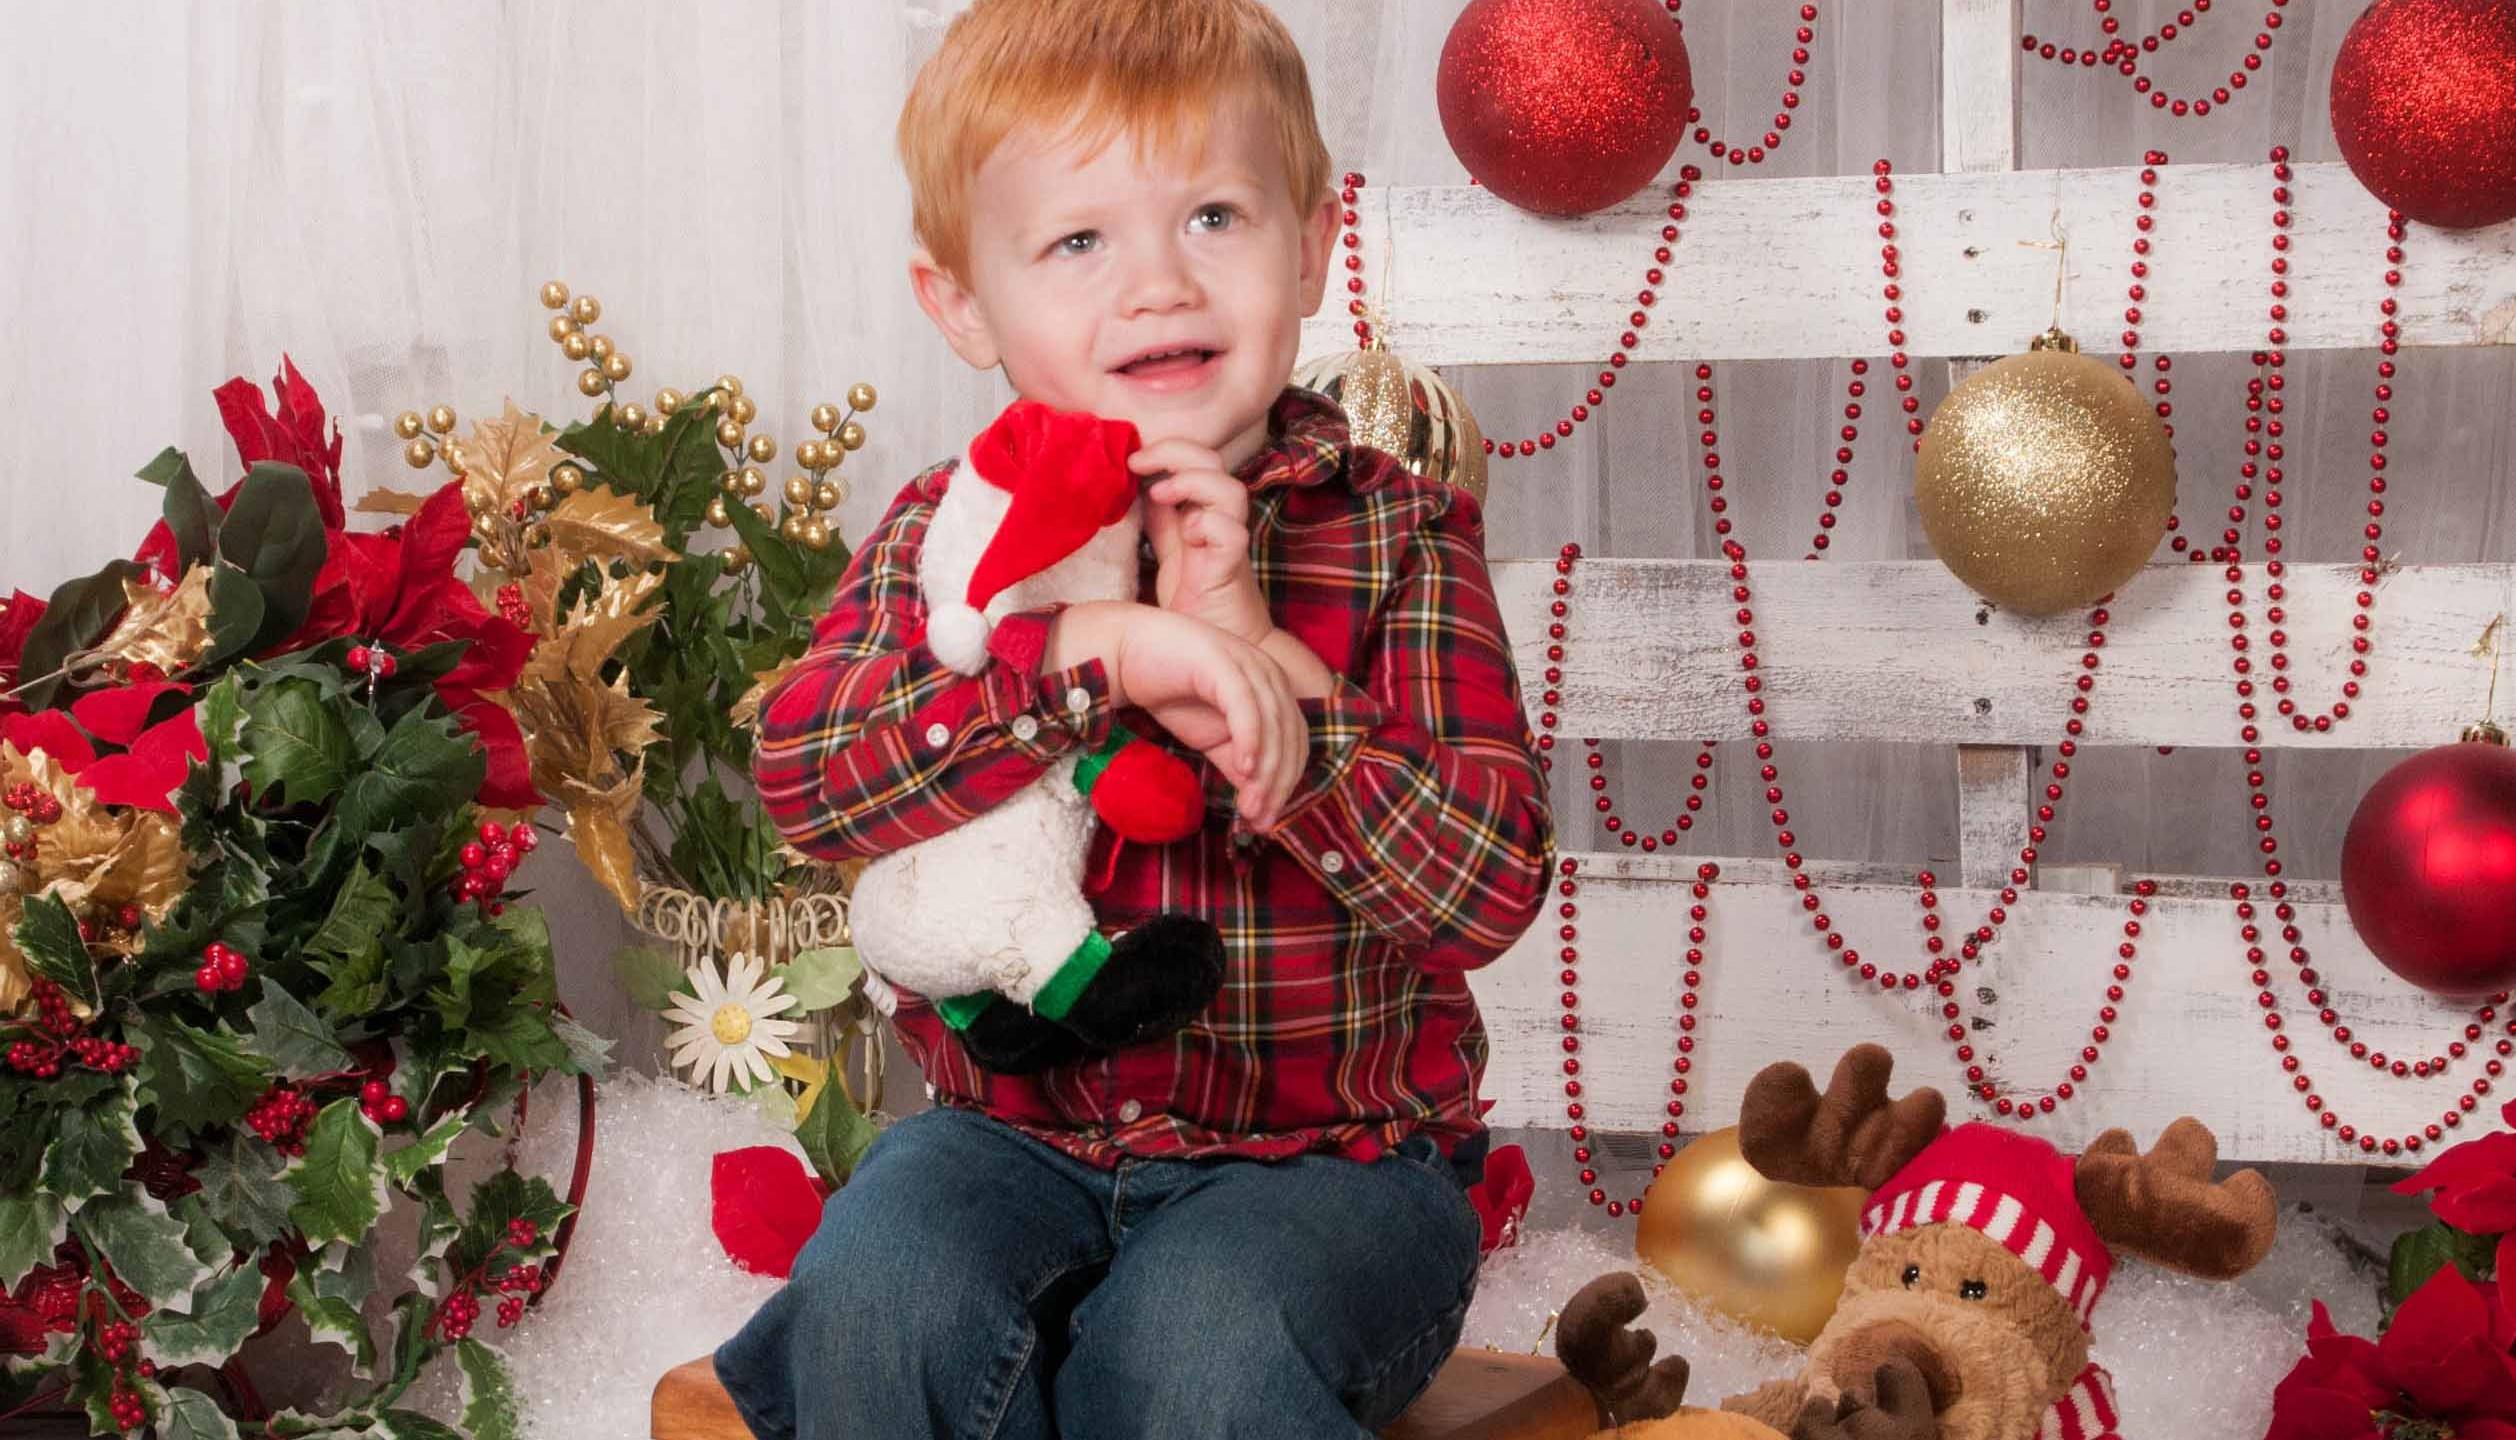 cutest childrens chrismtas photos, adorable holdiay poses, on-site photography buckeye, az